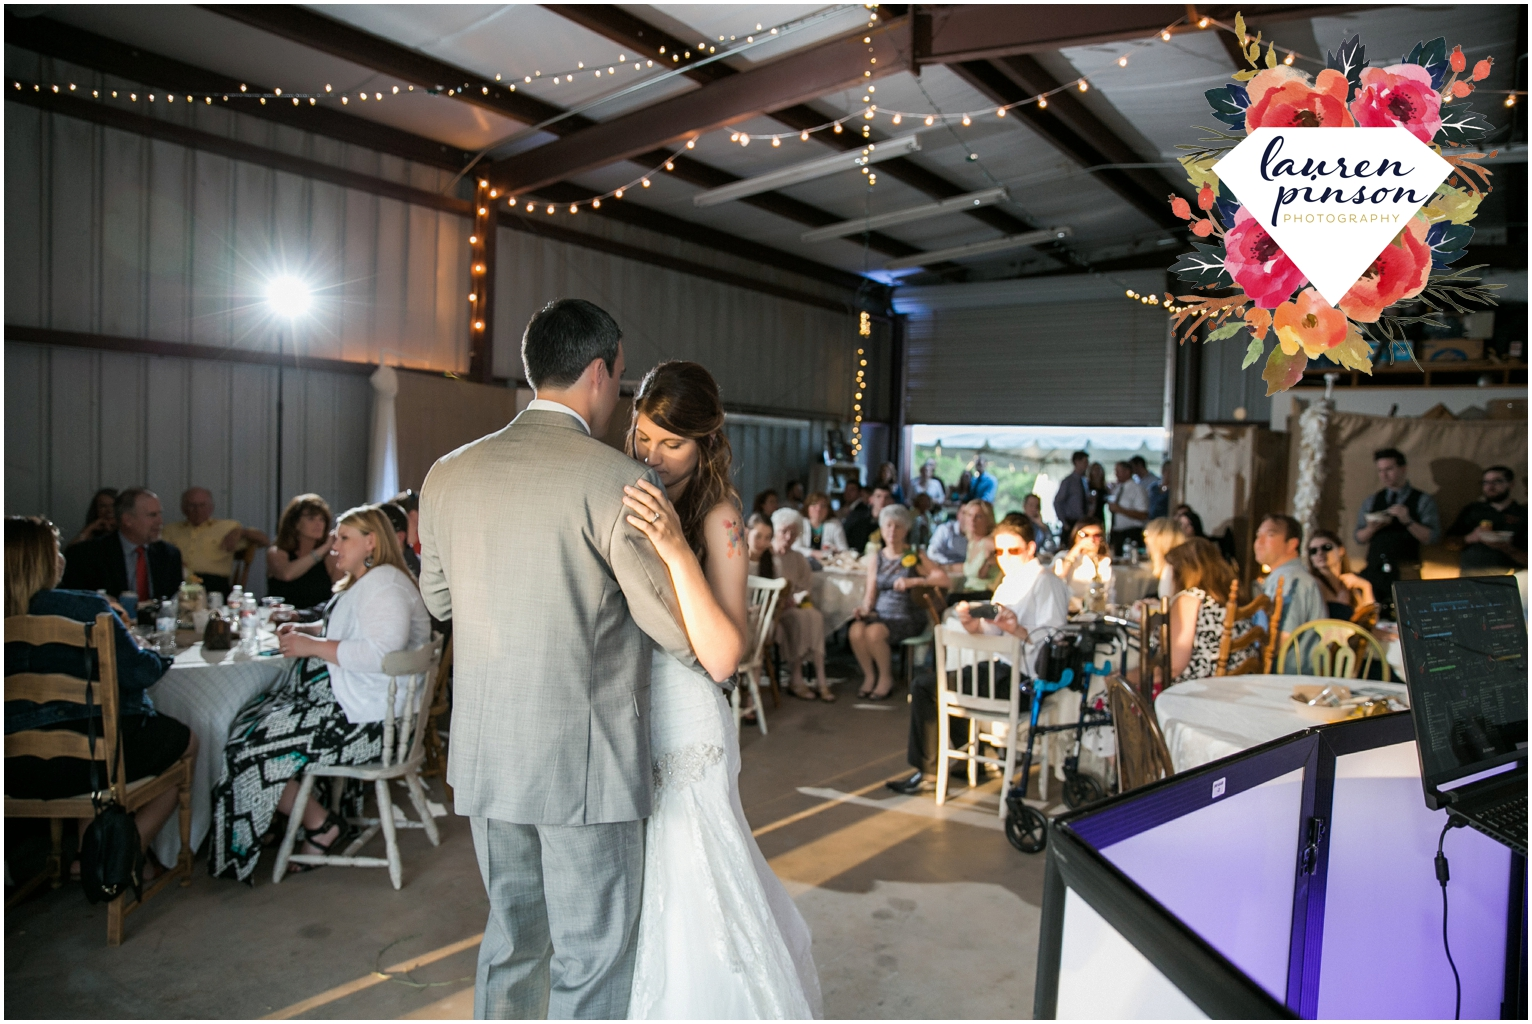 wichita-falls-wedding-photographer-oklahoma-wichita-mountains-bridal-session-bridals-photography_0771.jpg